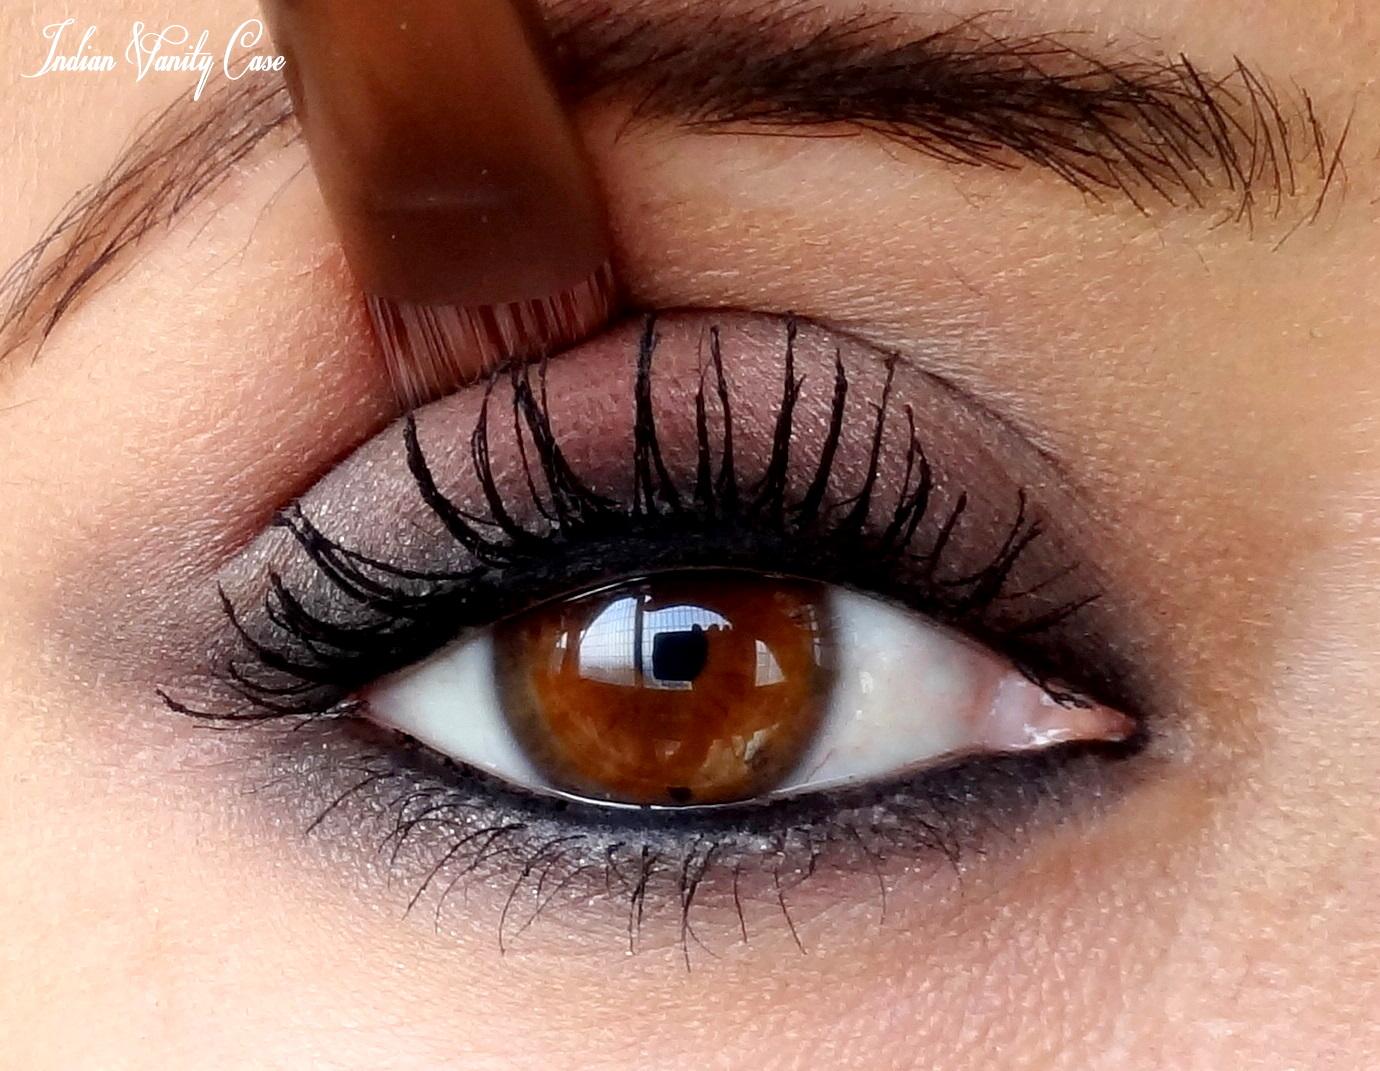 indian vanity case kareena kapoor eye makeup bollywood